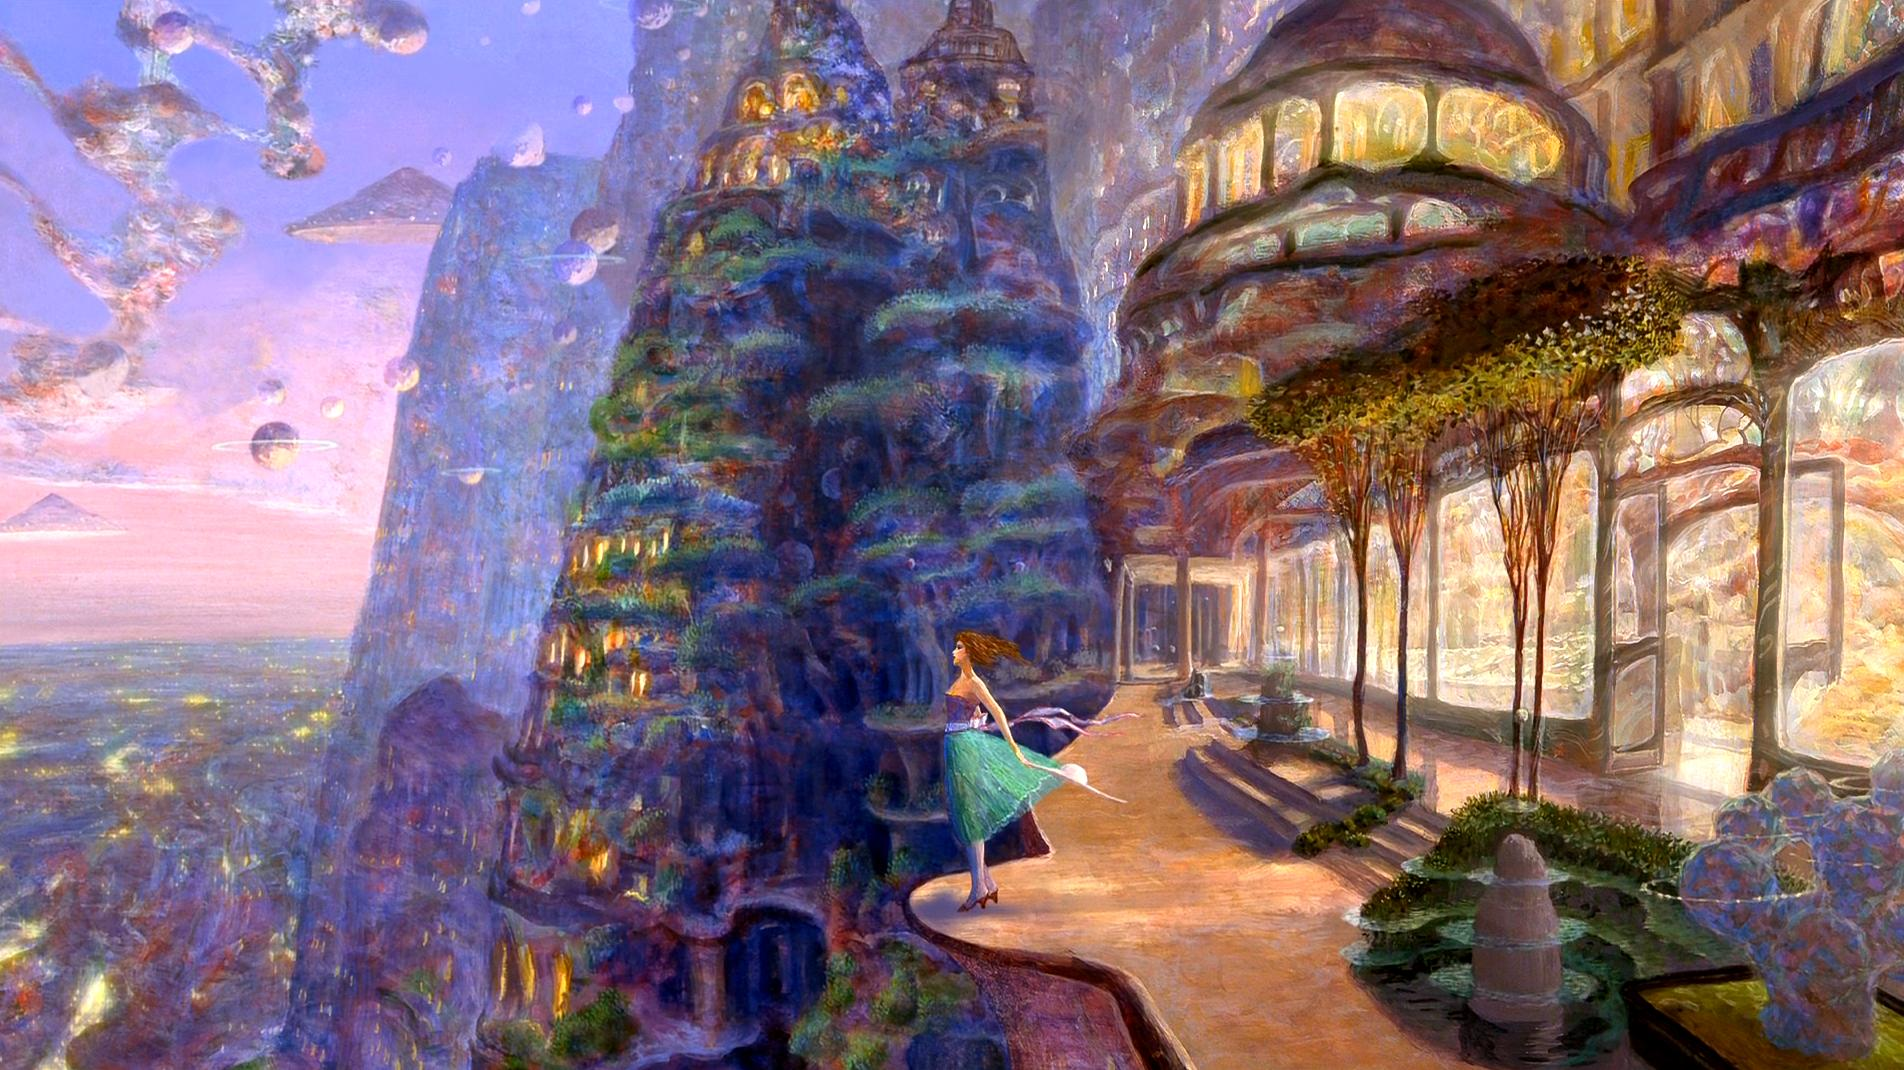 Studio Ghibli, Scenery | page 3 - Zerochan Anime Image Board